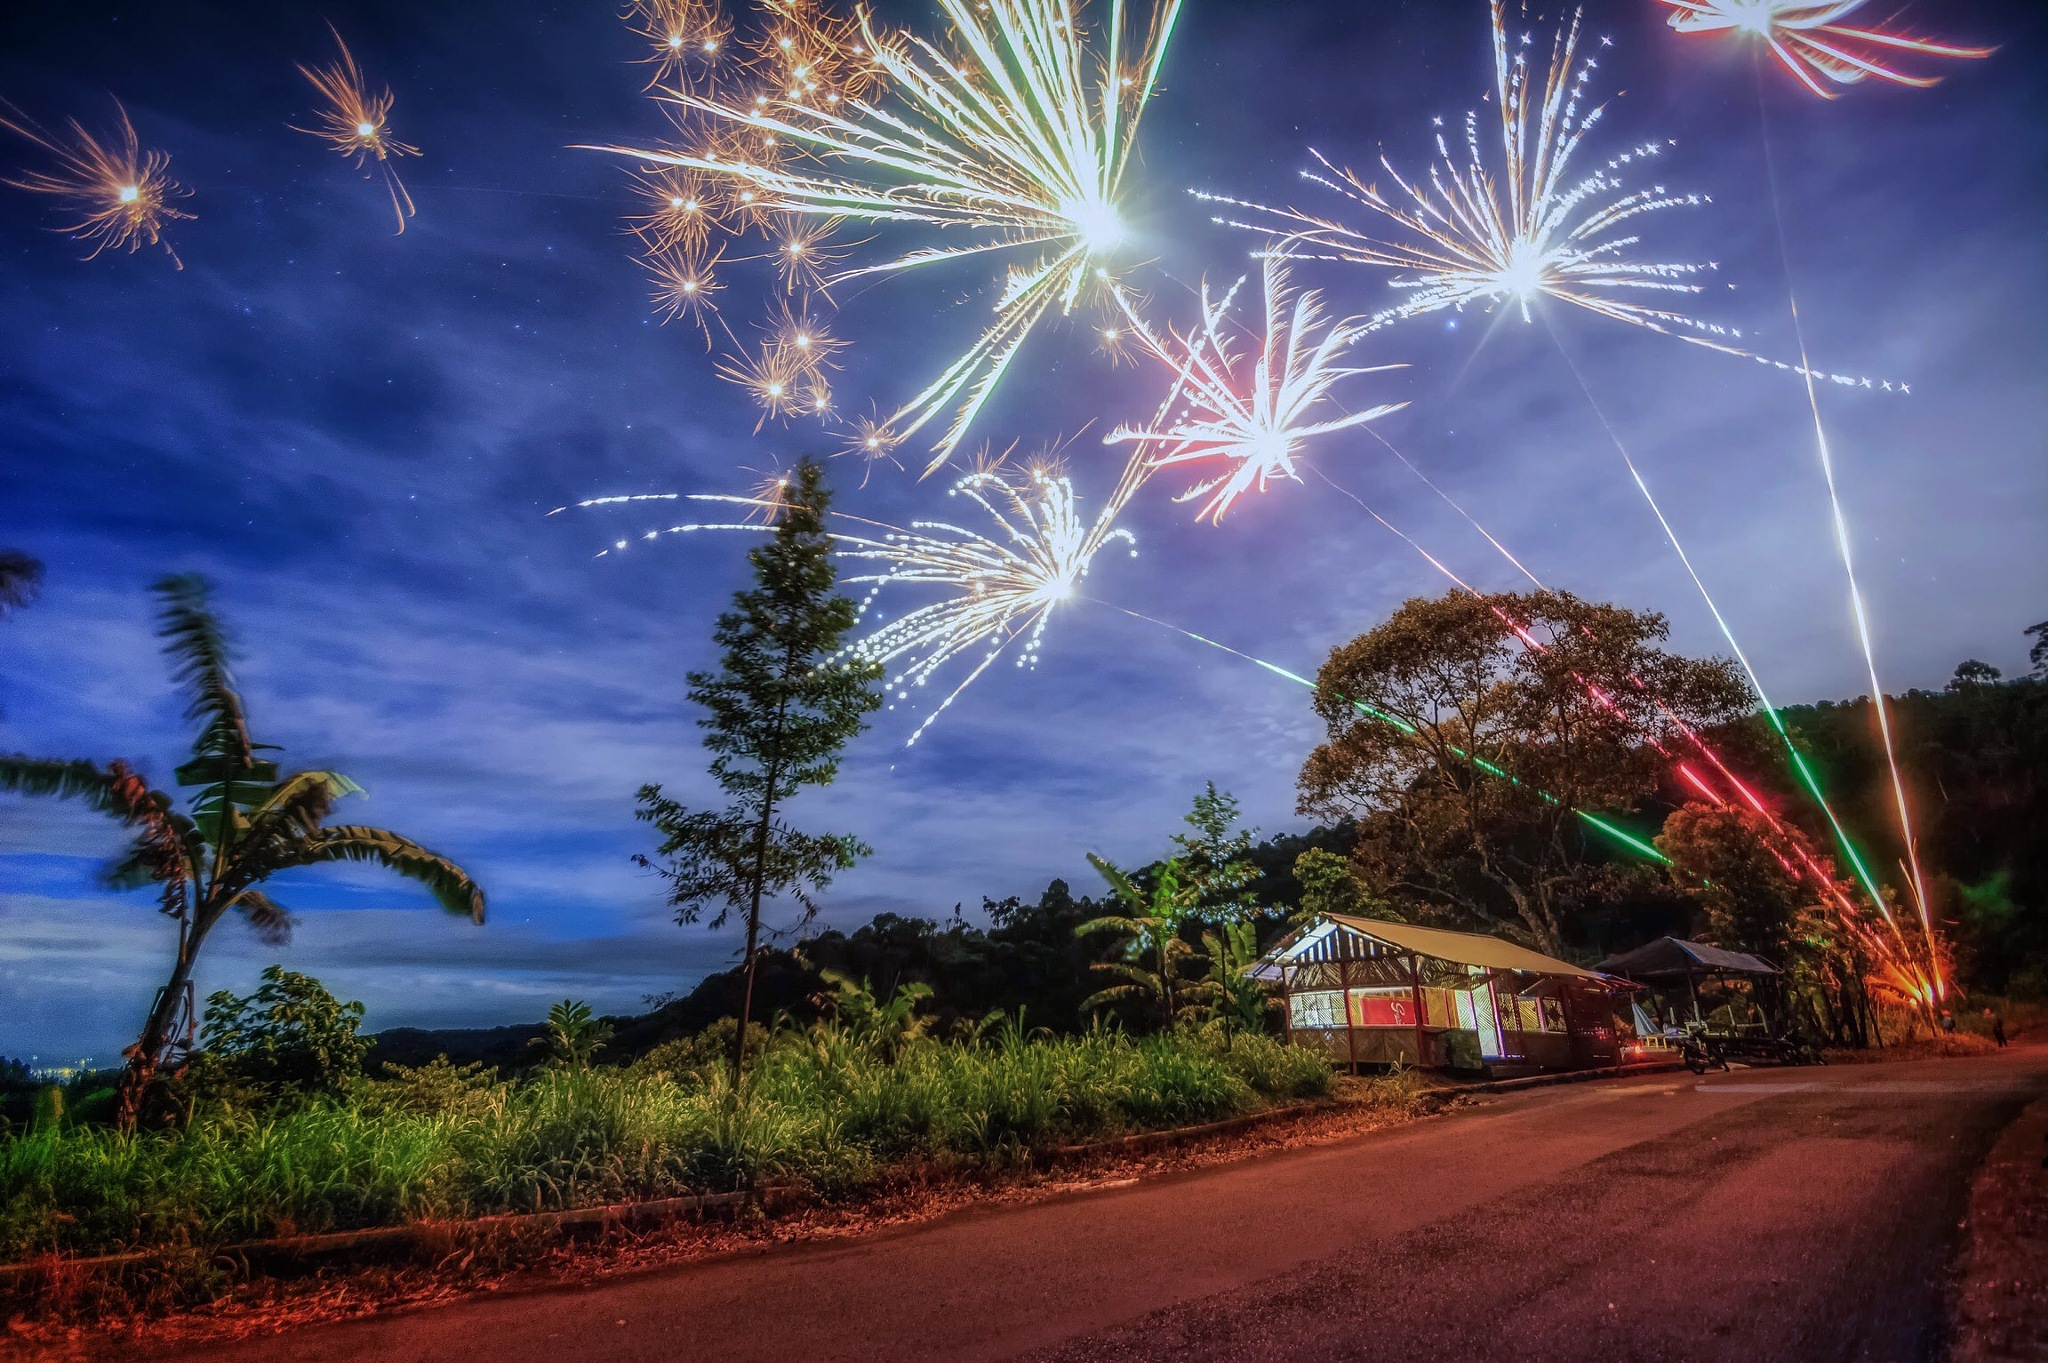 New uear eve by Adam Victor Handoyo